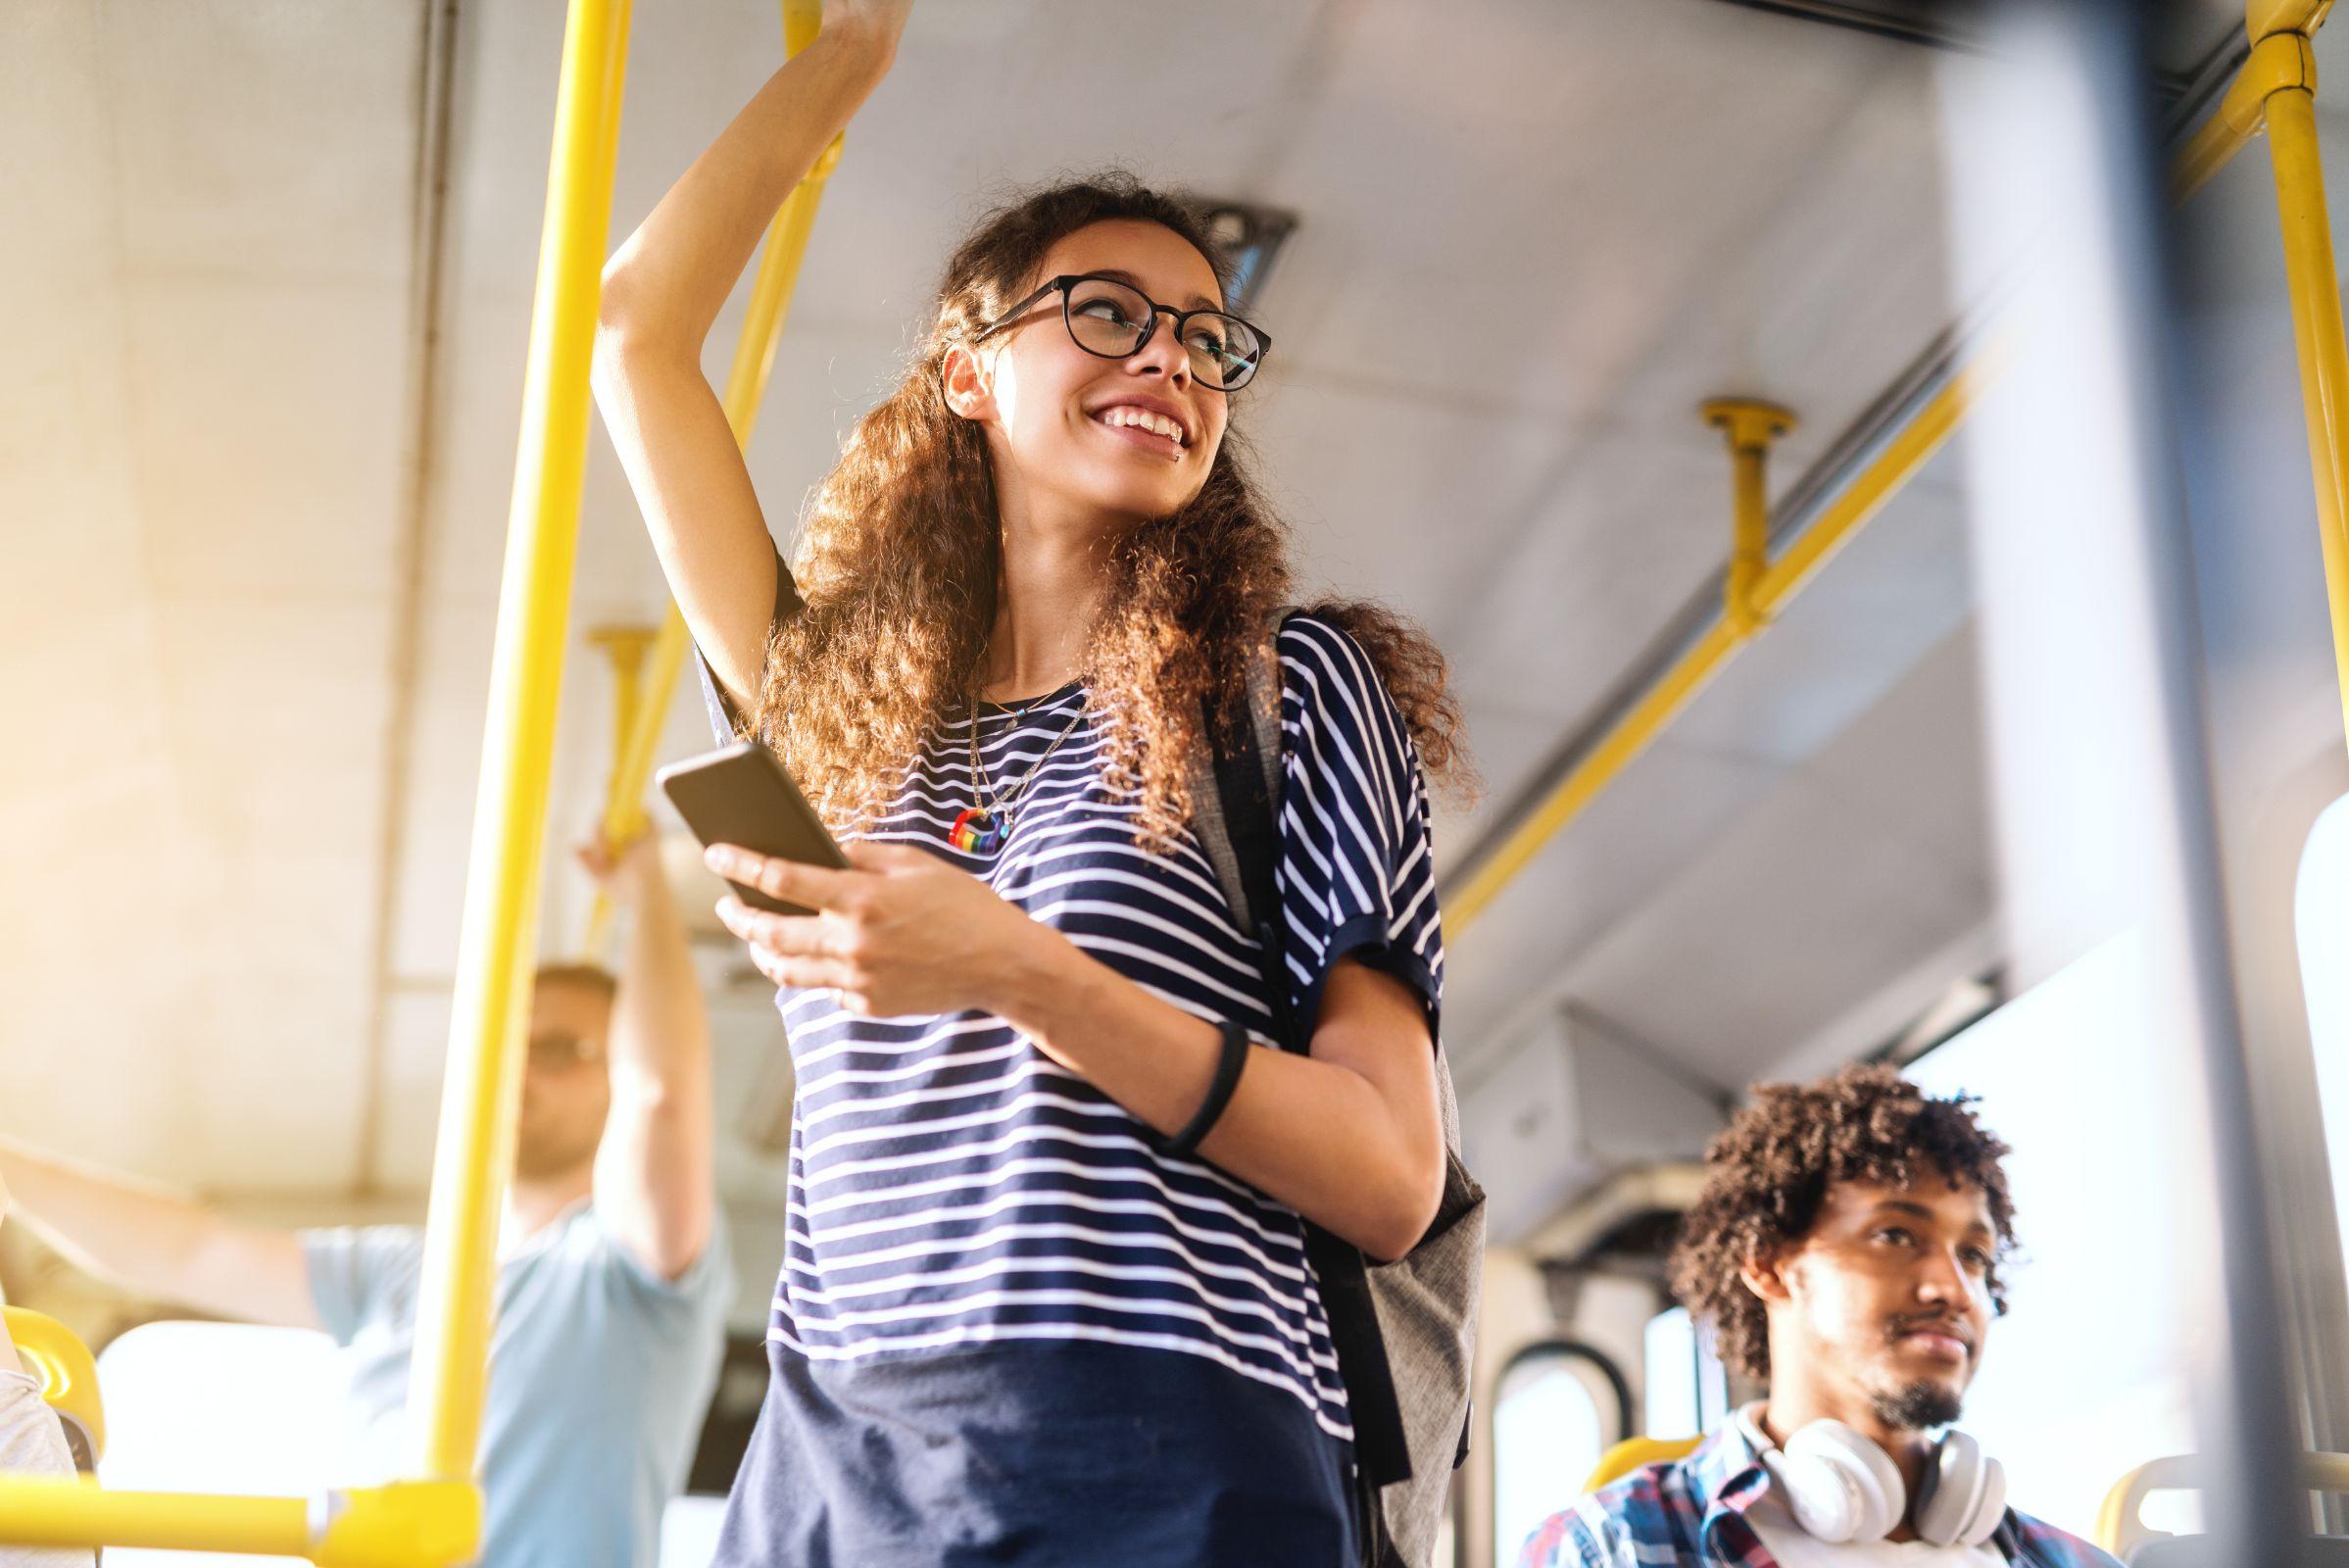 musica no onibus celular transporte publico shutterstock